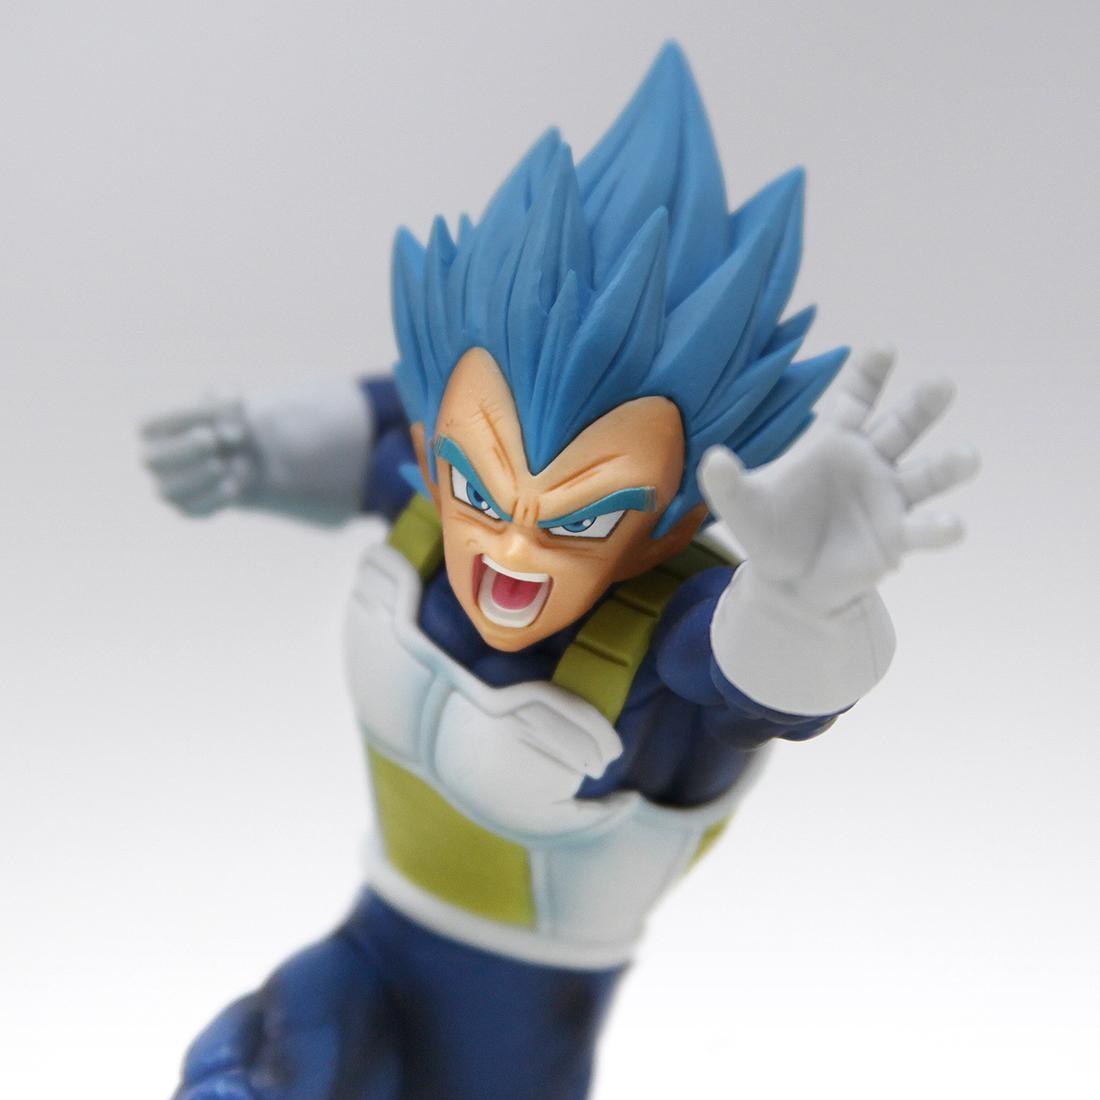 Banpresto The Movie Dragon Ball Super Broly SCultures The TAG Team Super Saiyan God Super Saiyan Vegeta Z-Battle Figure